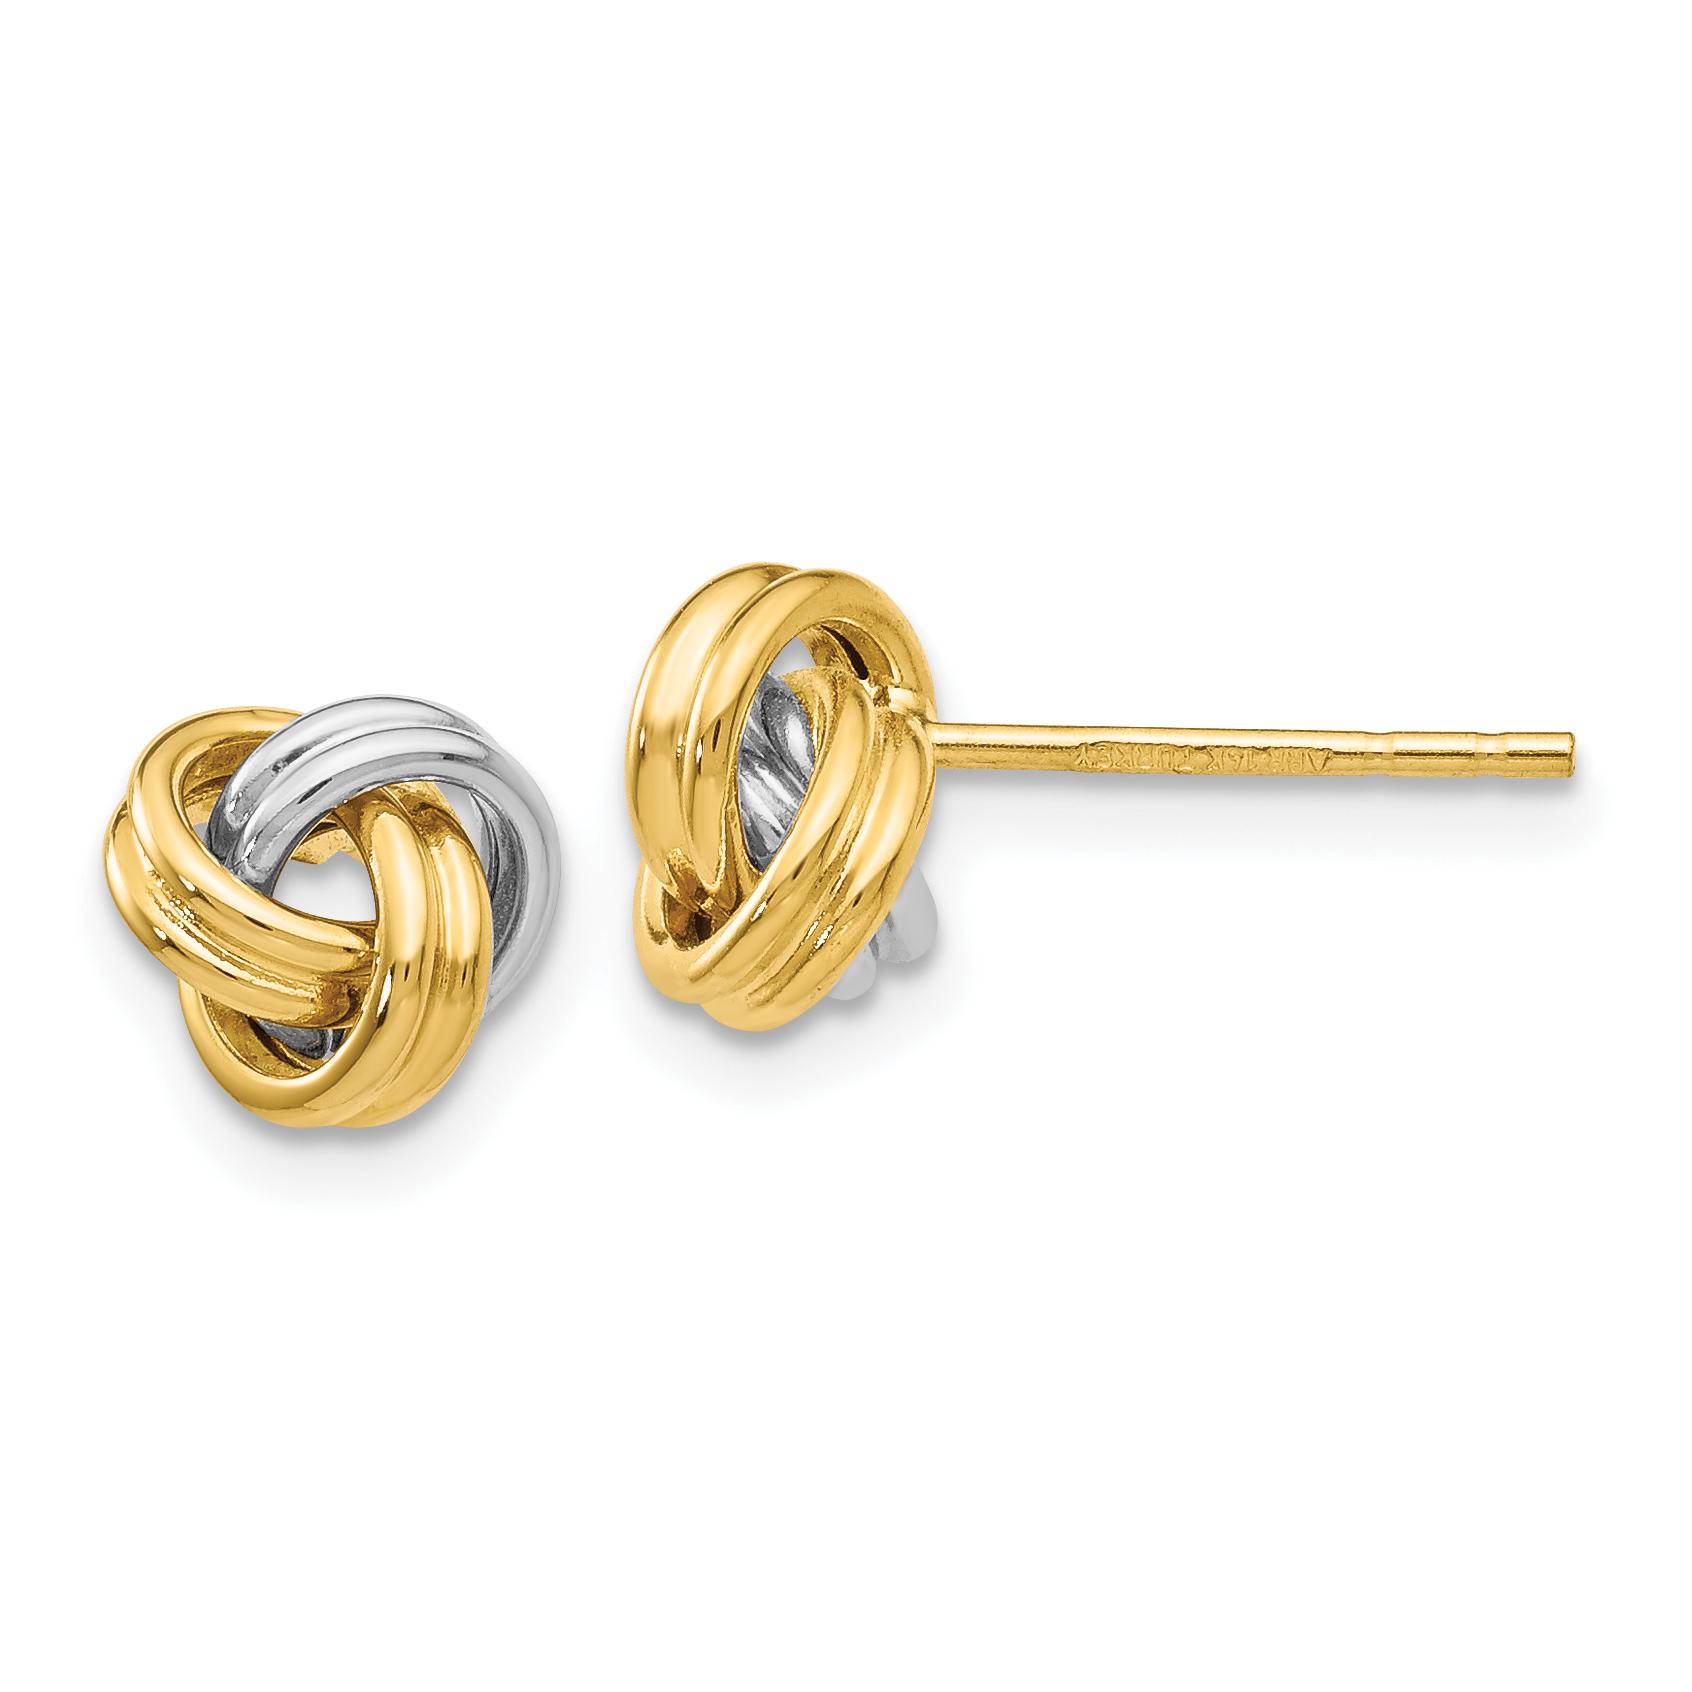 Italian Love Knot Rosetta Stud Earrings with Push Back Post Real 14K Yellow Gold